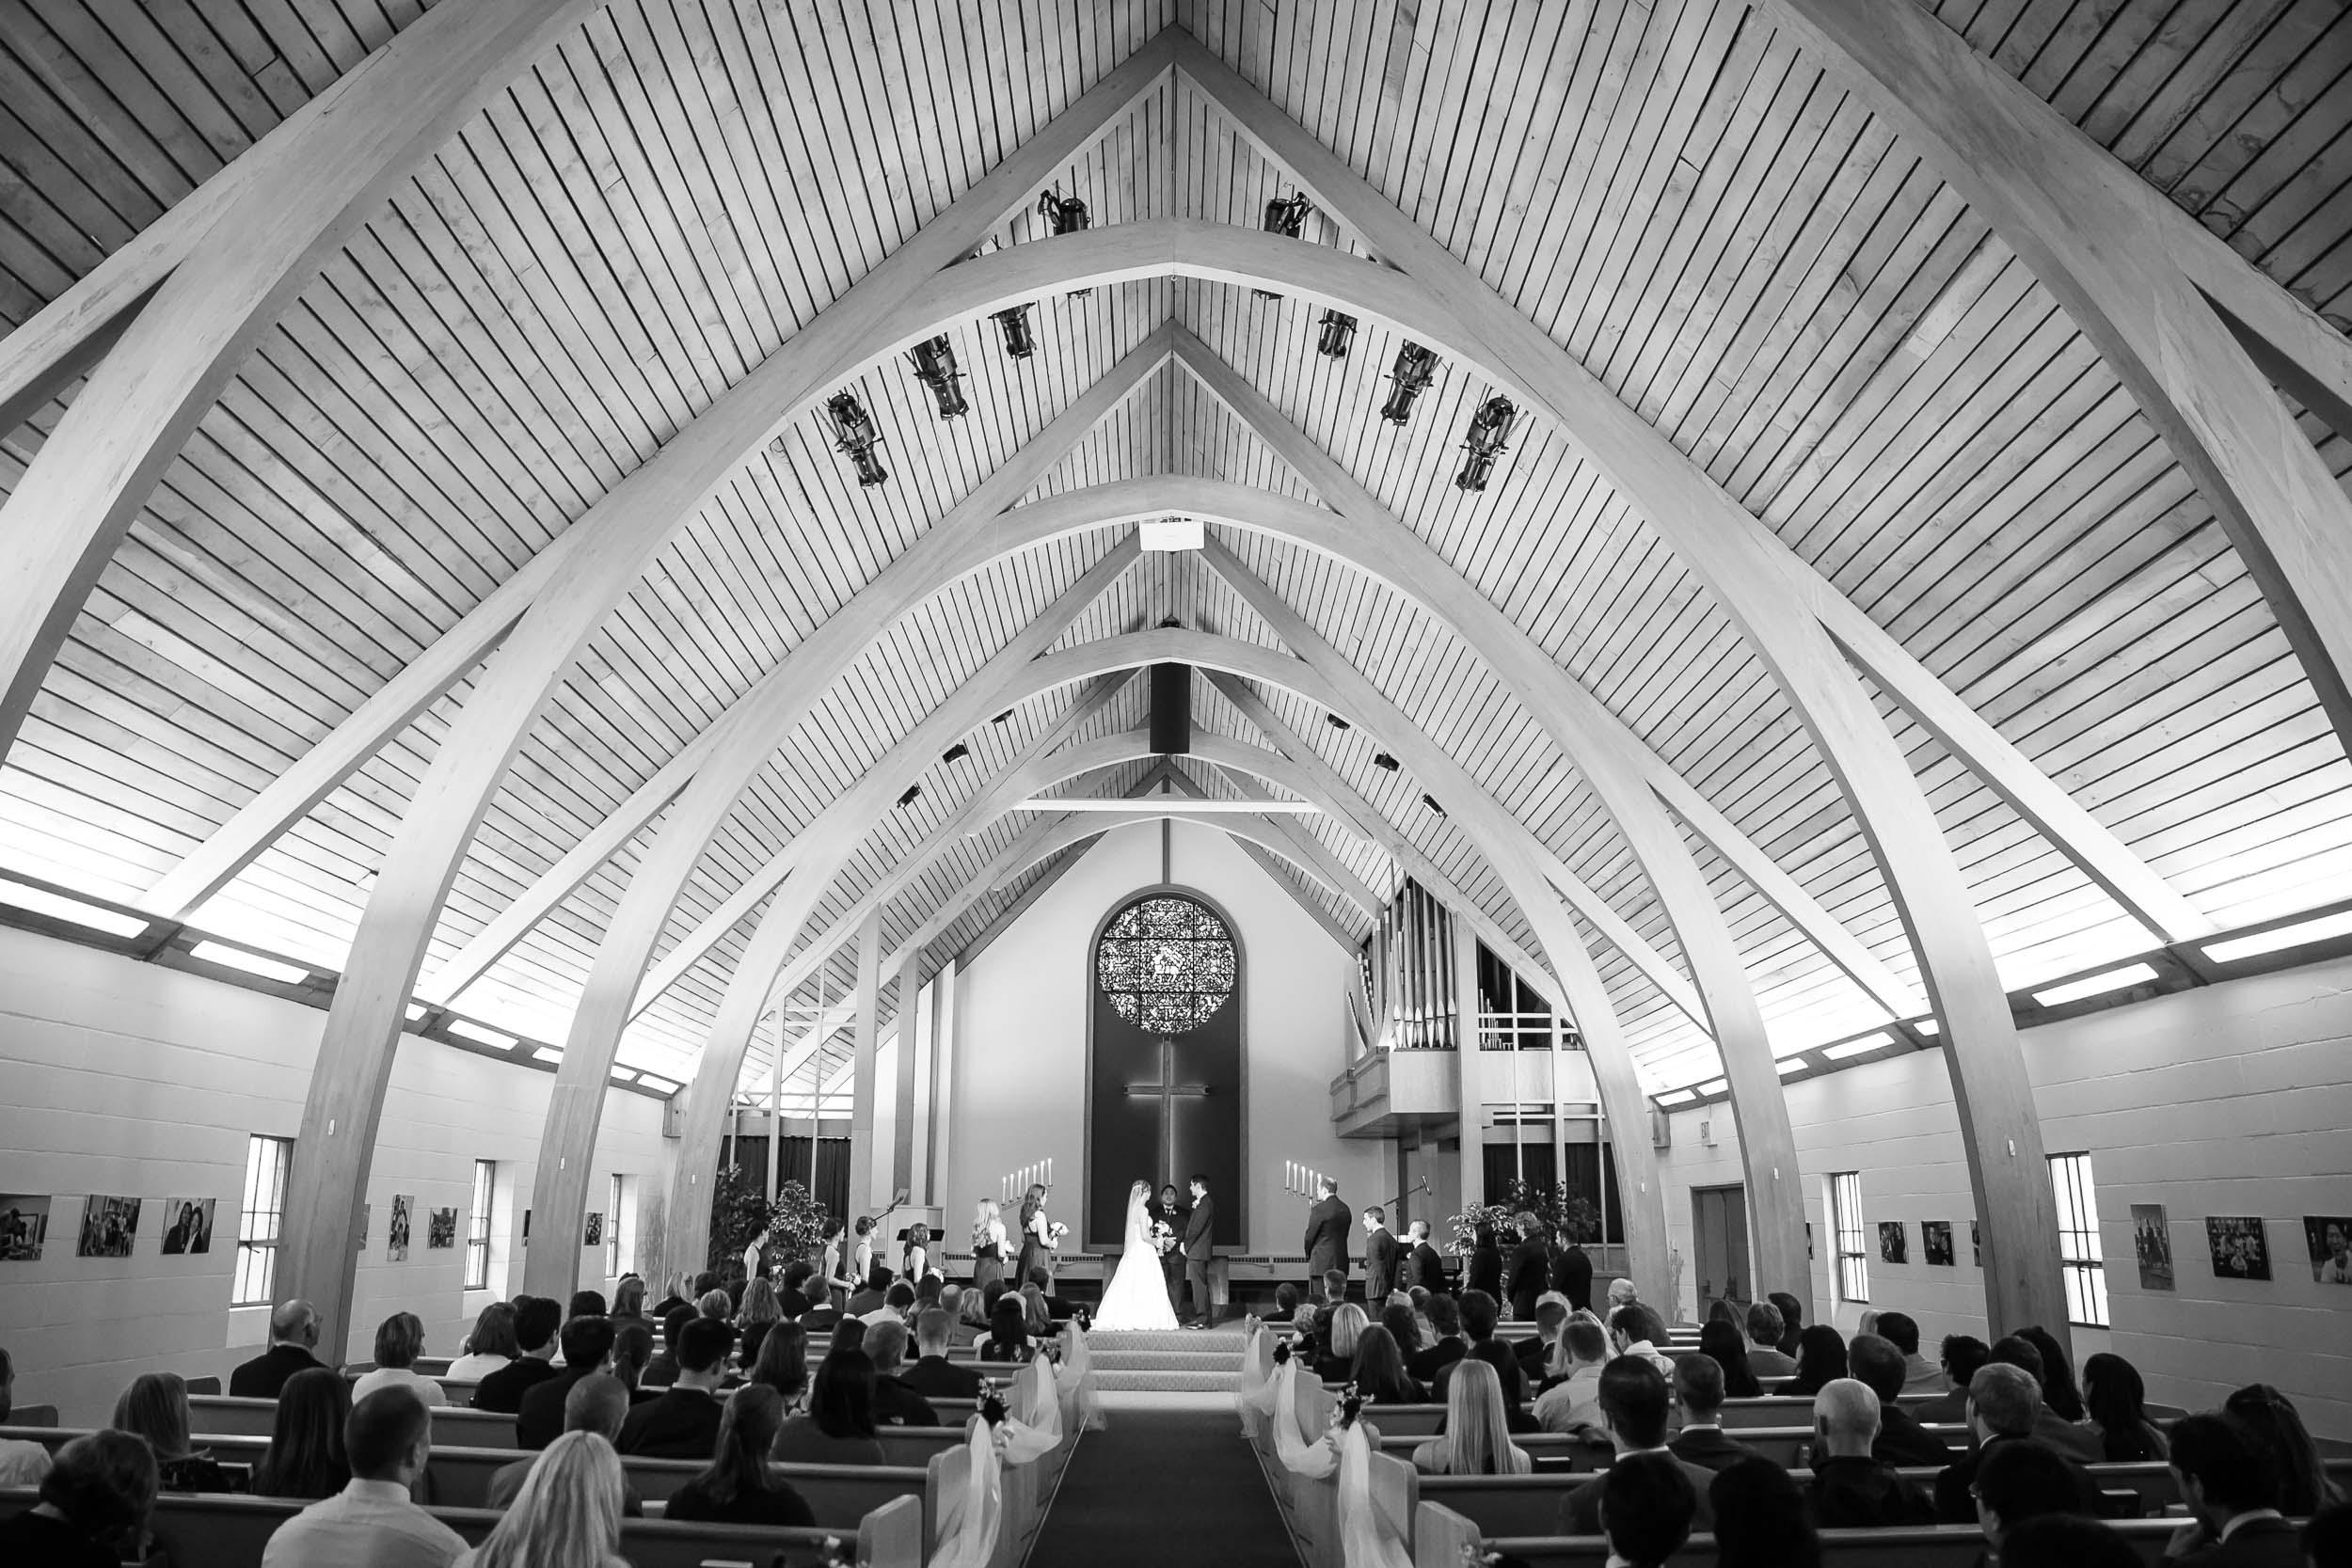 Wedding ceremony at church   Durham Wedding Photographer   By G. Lin Photography